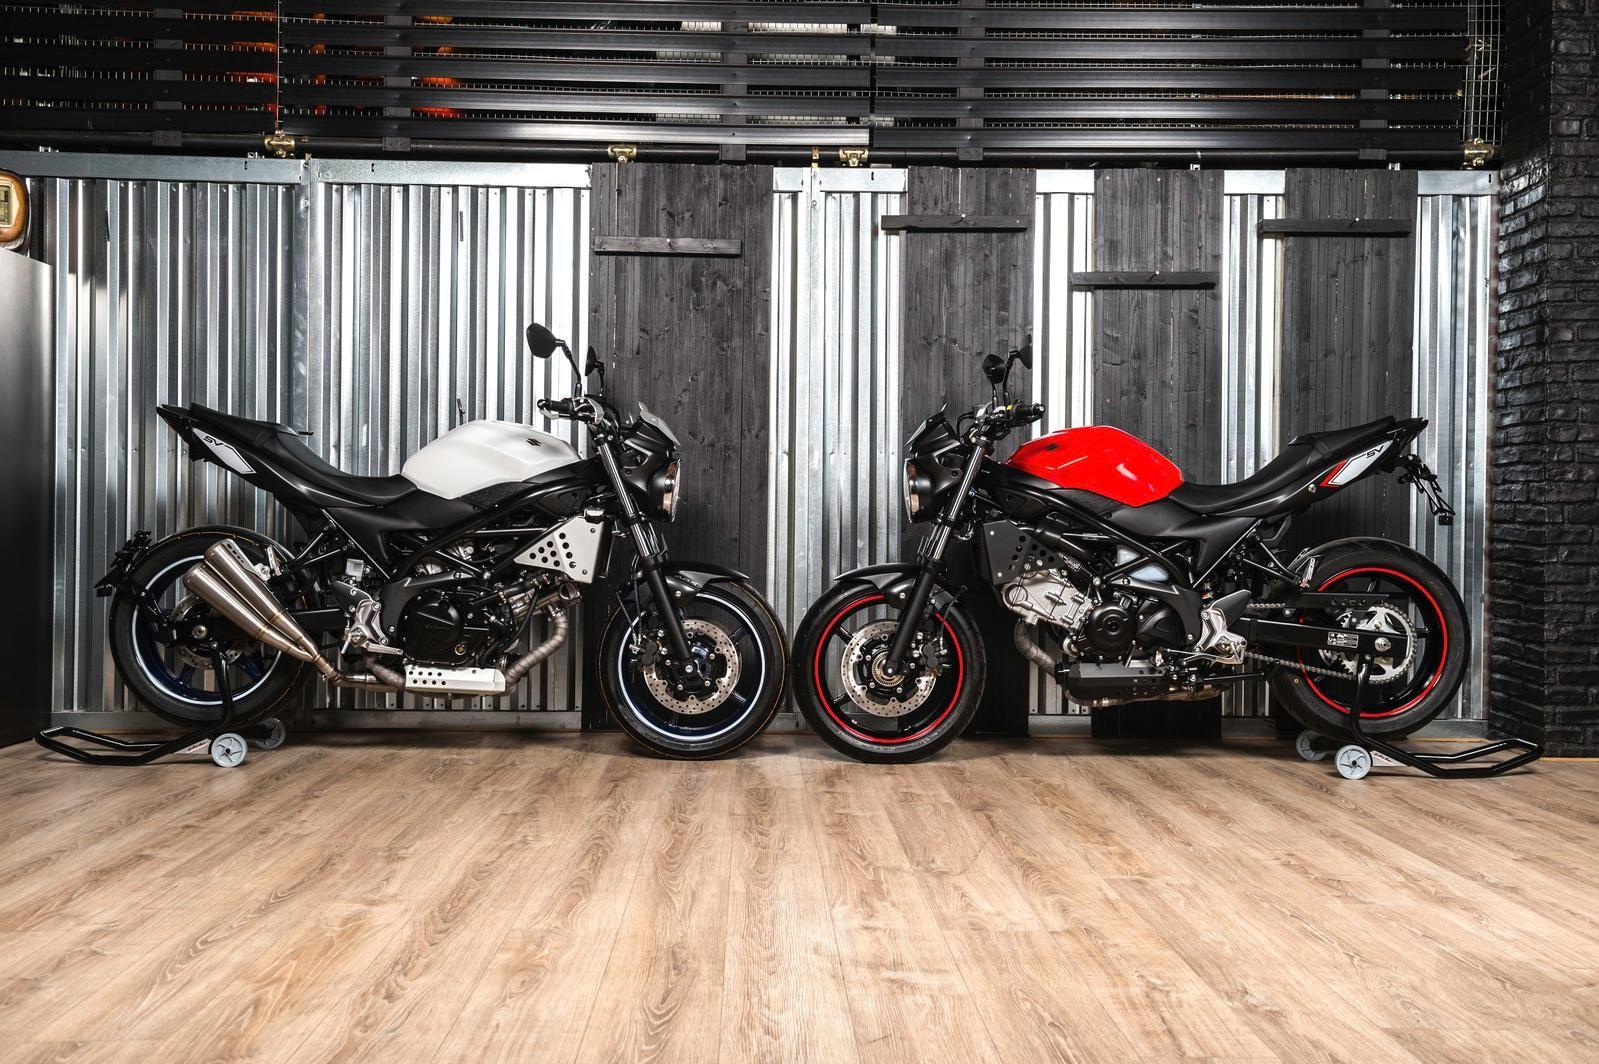 Motor Bike Expo Suzuki: special e show bike - Dueruote